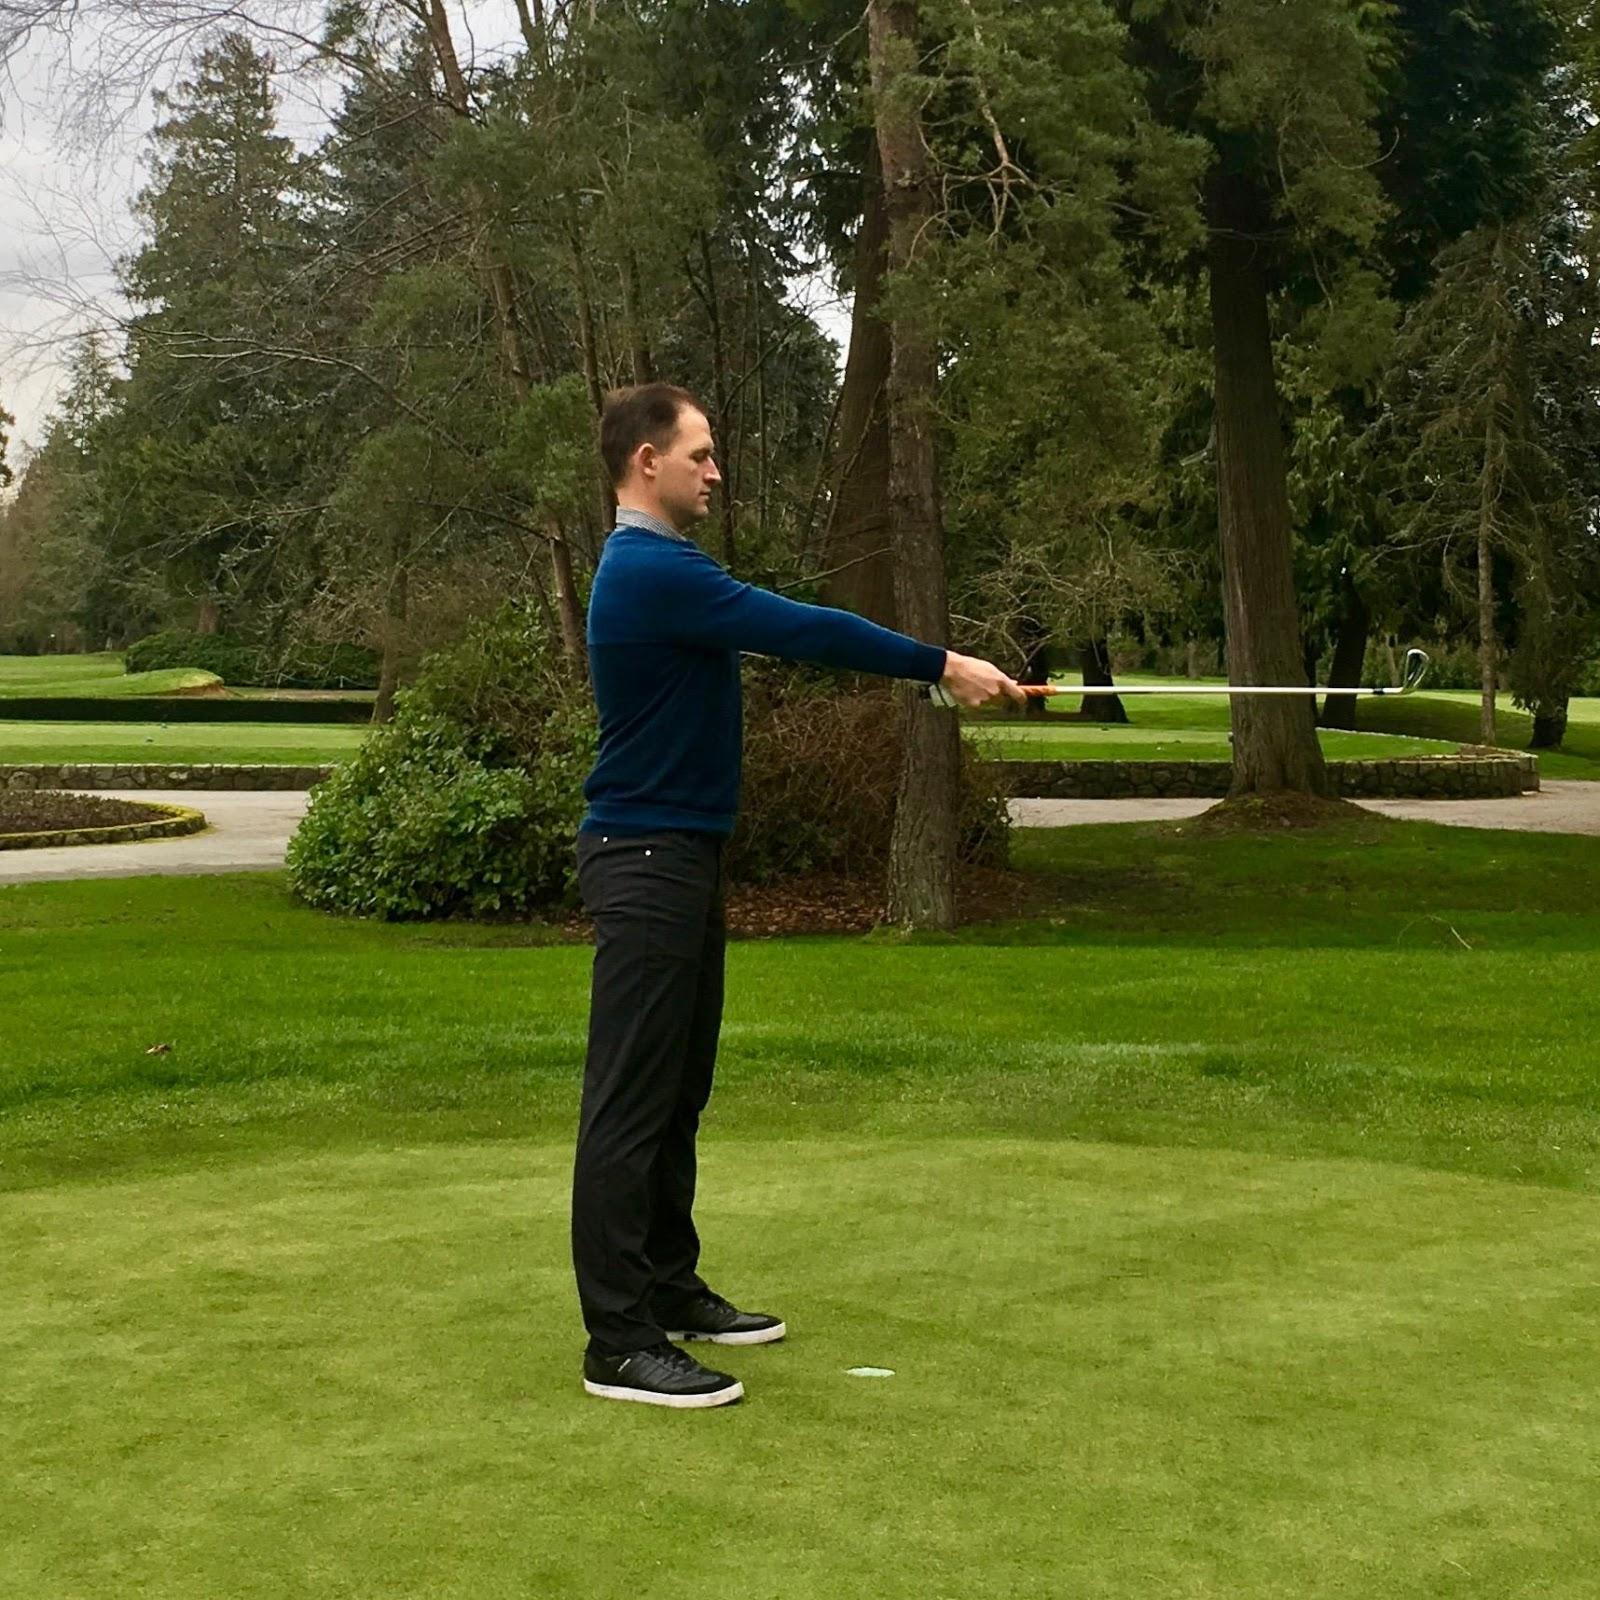 Proper Golf Stance Step 1